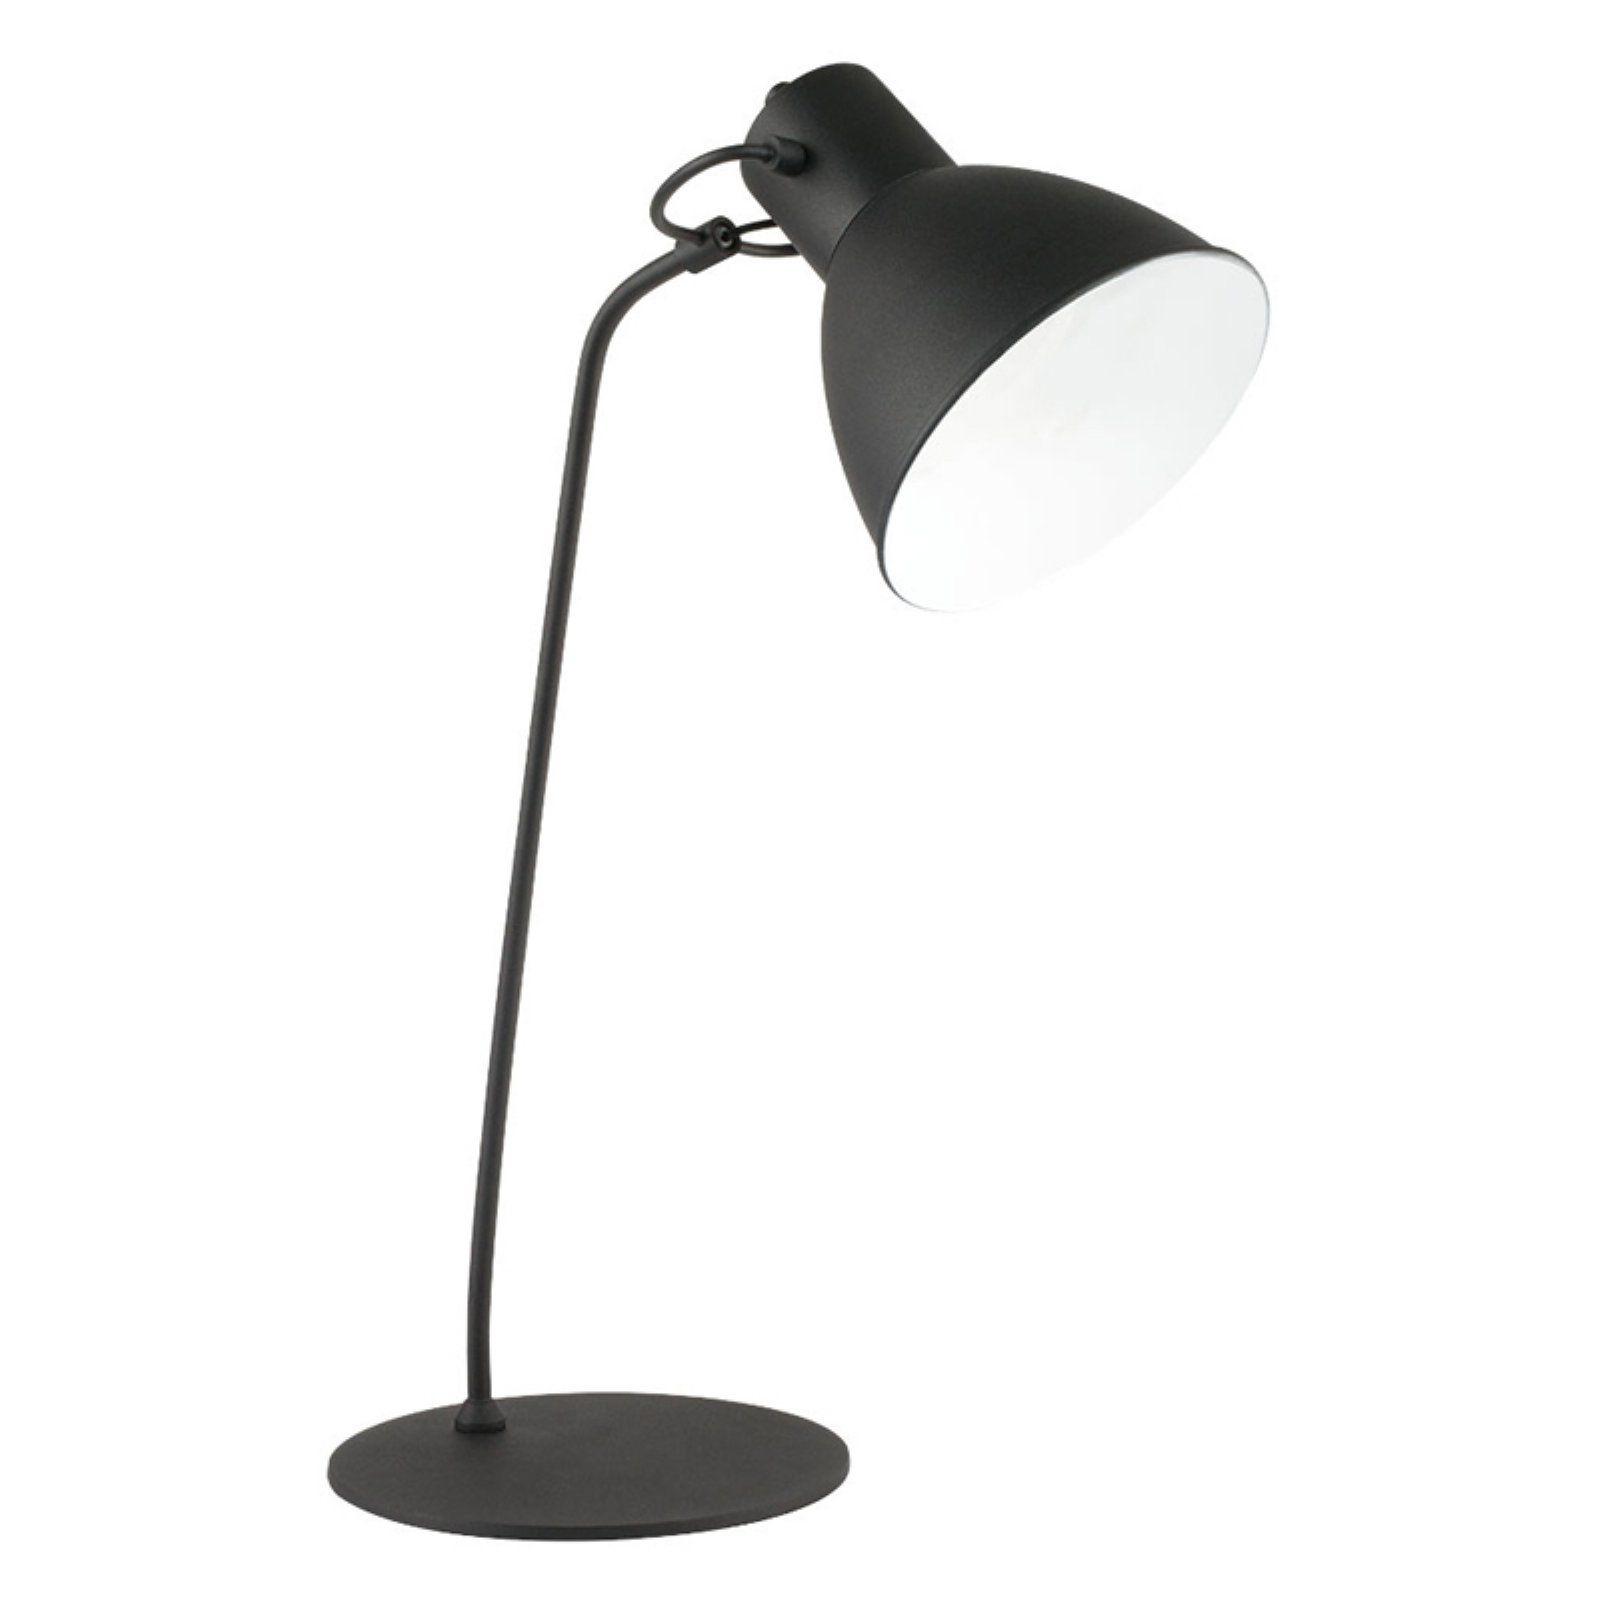 Ottlite Destin Desk Lamp Table Lamp Black Table Lamps with regard to dimensions 1600 X 1600